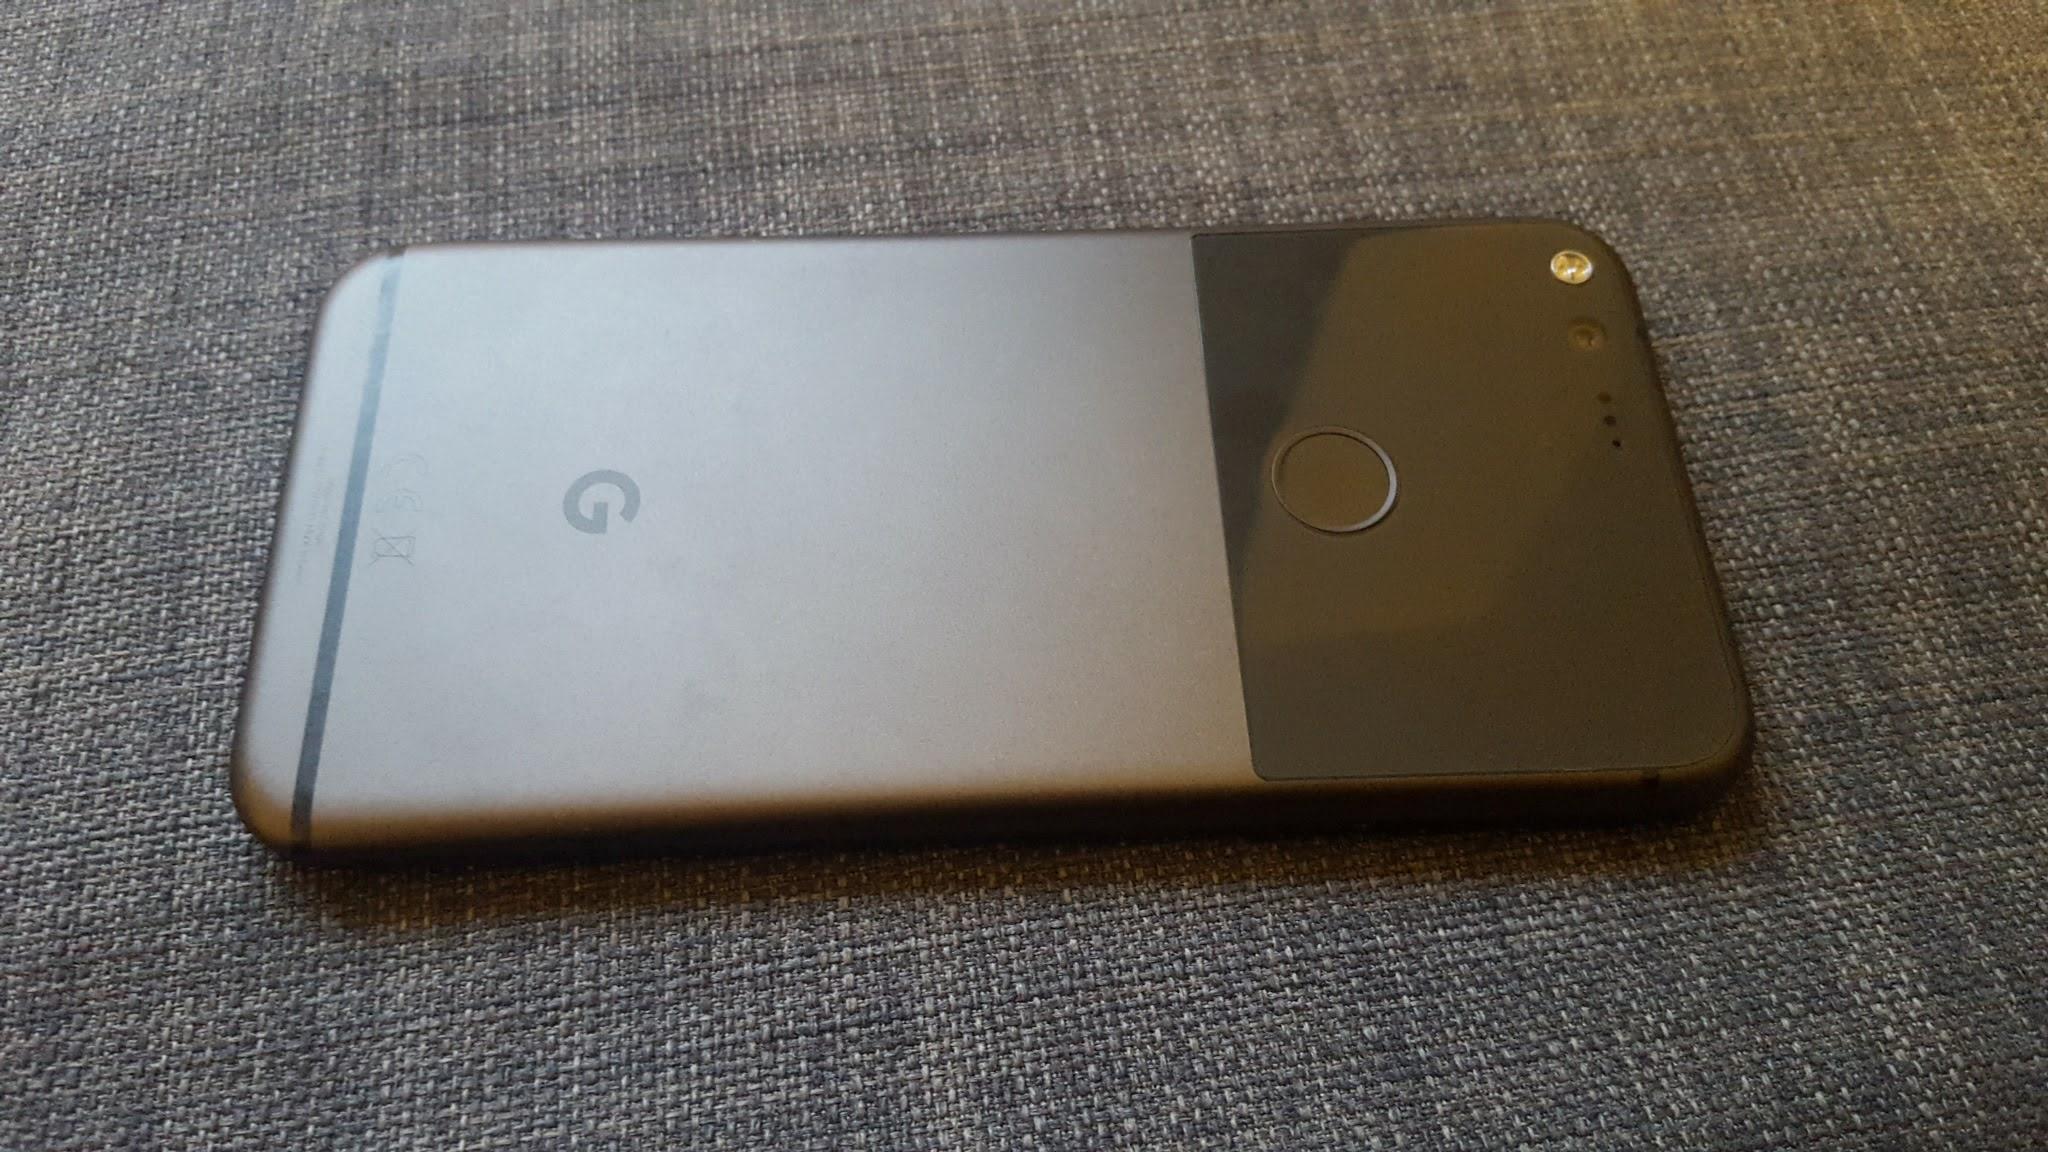 Pixel XL rear